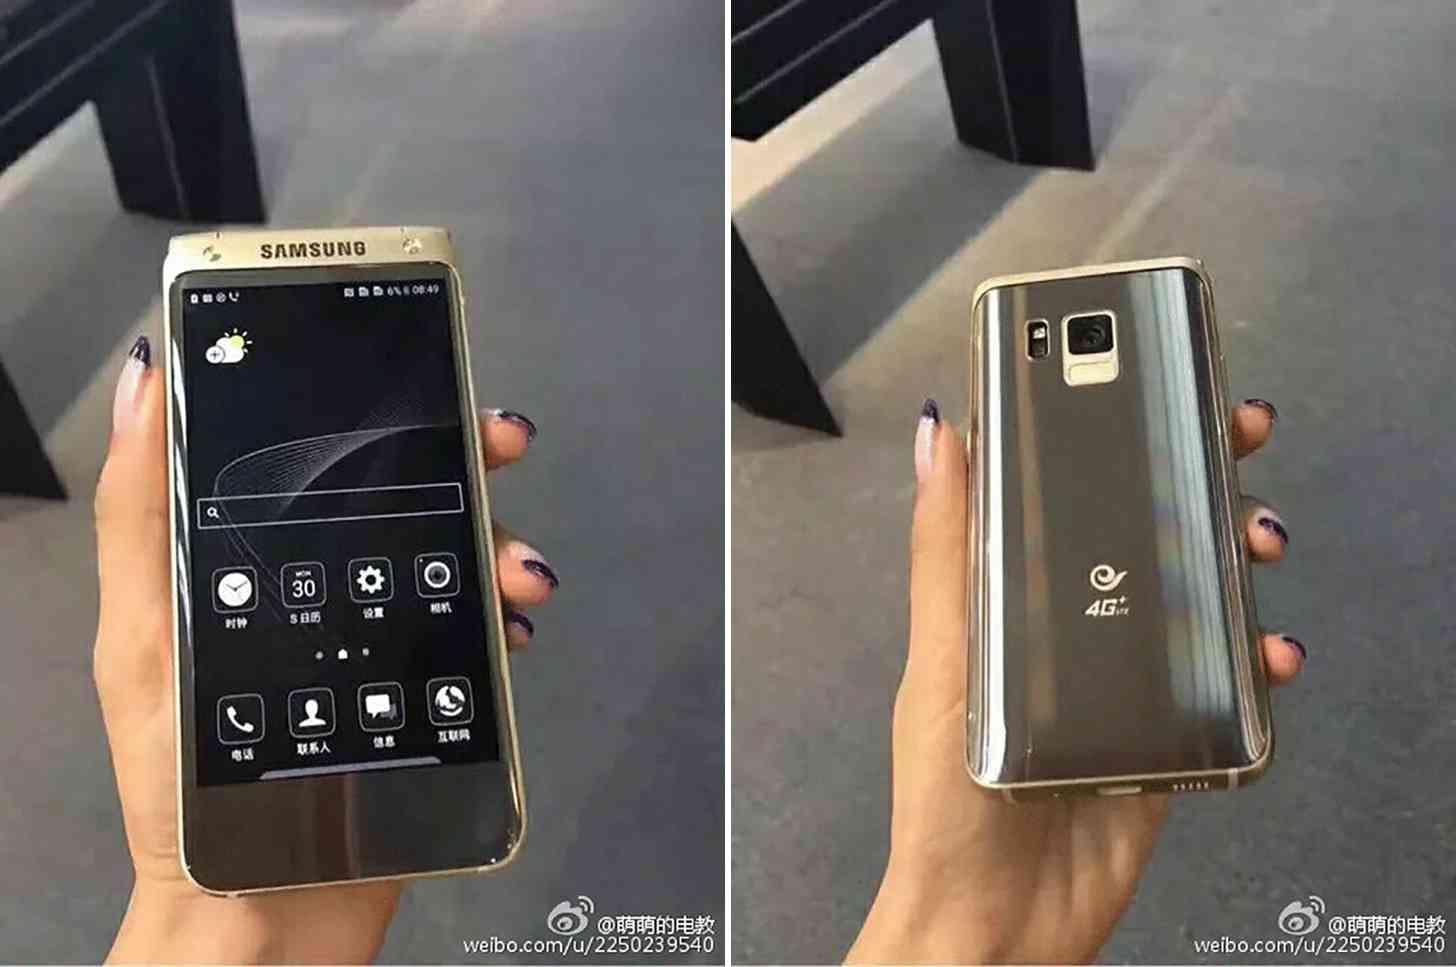 Samsung SM-W2017 high-end Android flip phone leak